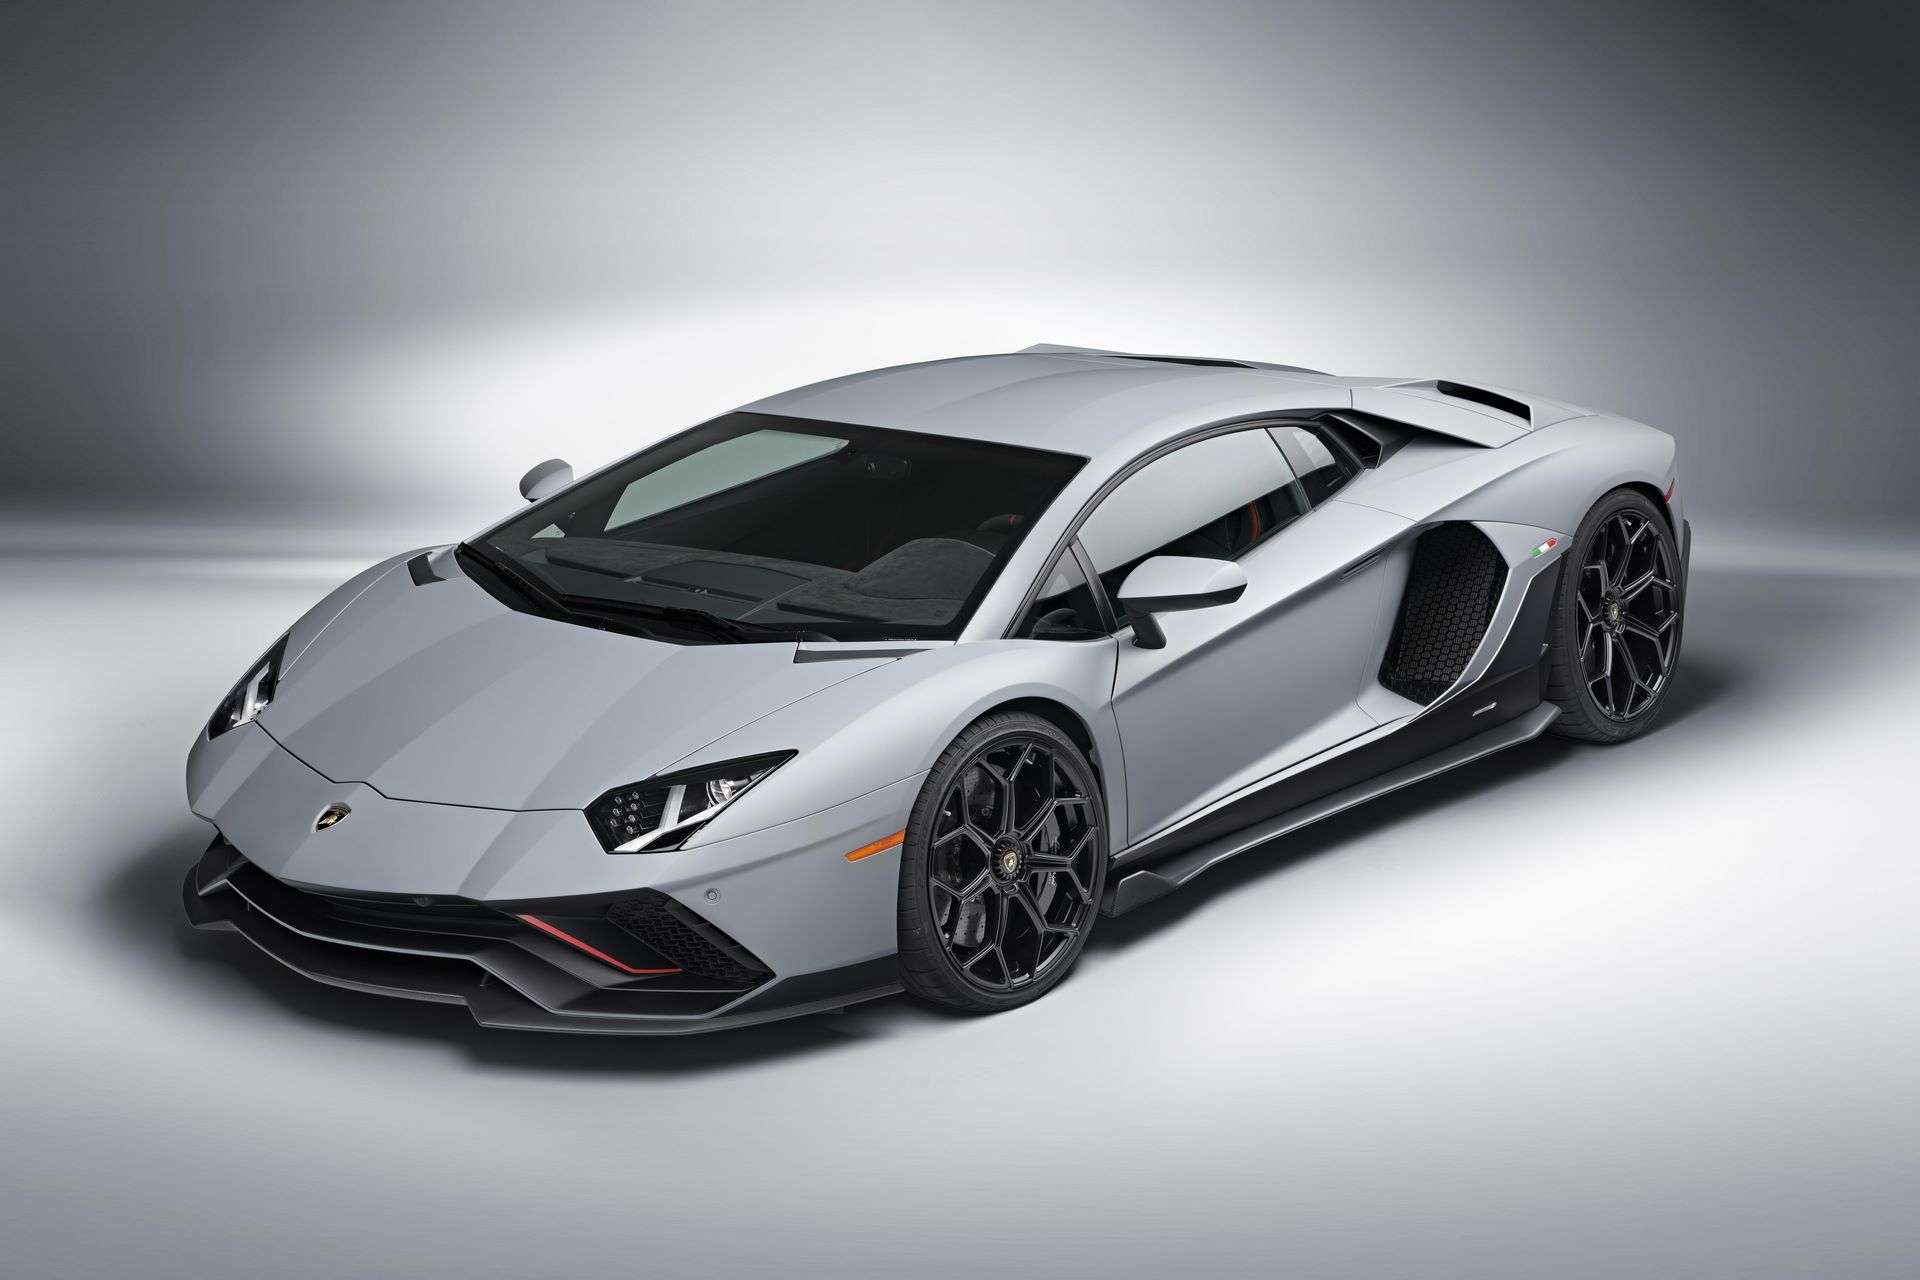 Lamborghini-Aventador-LP780-4-Ultimae-31